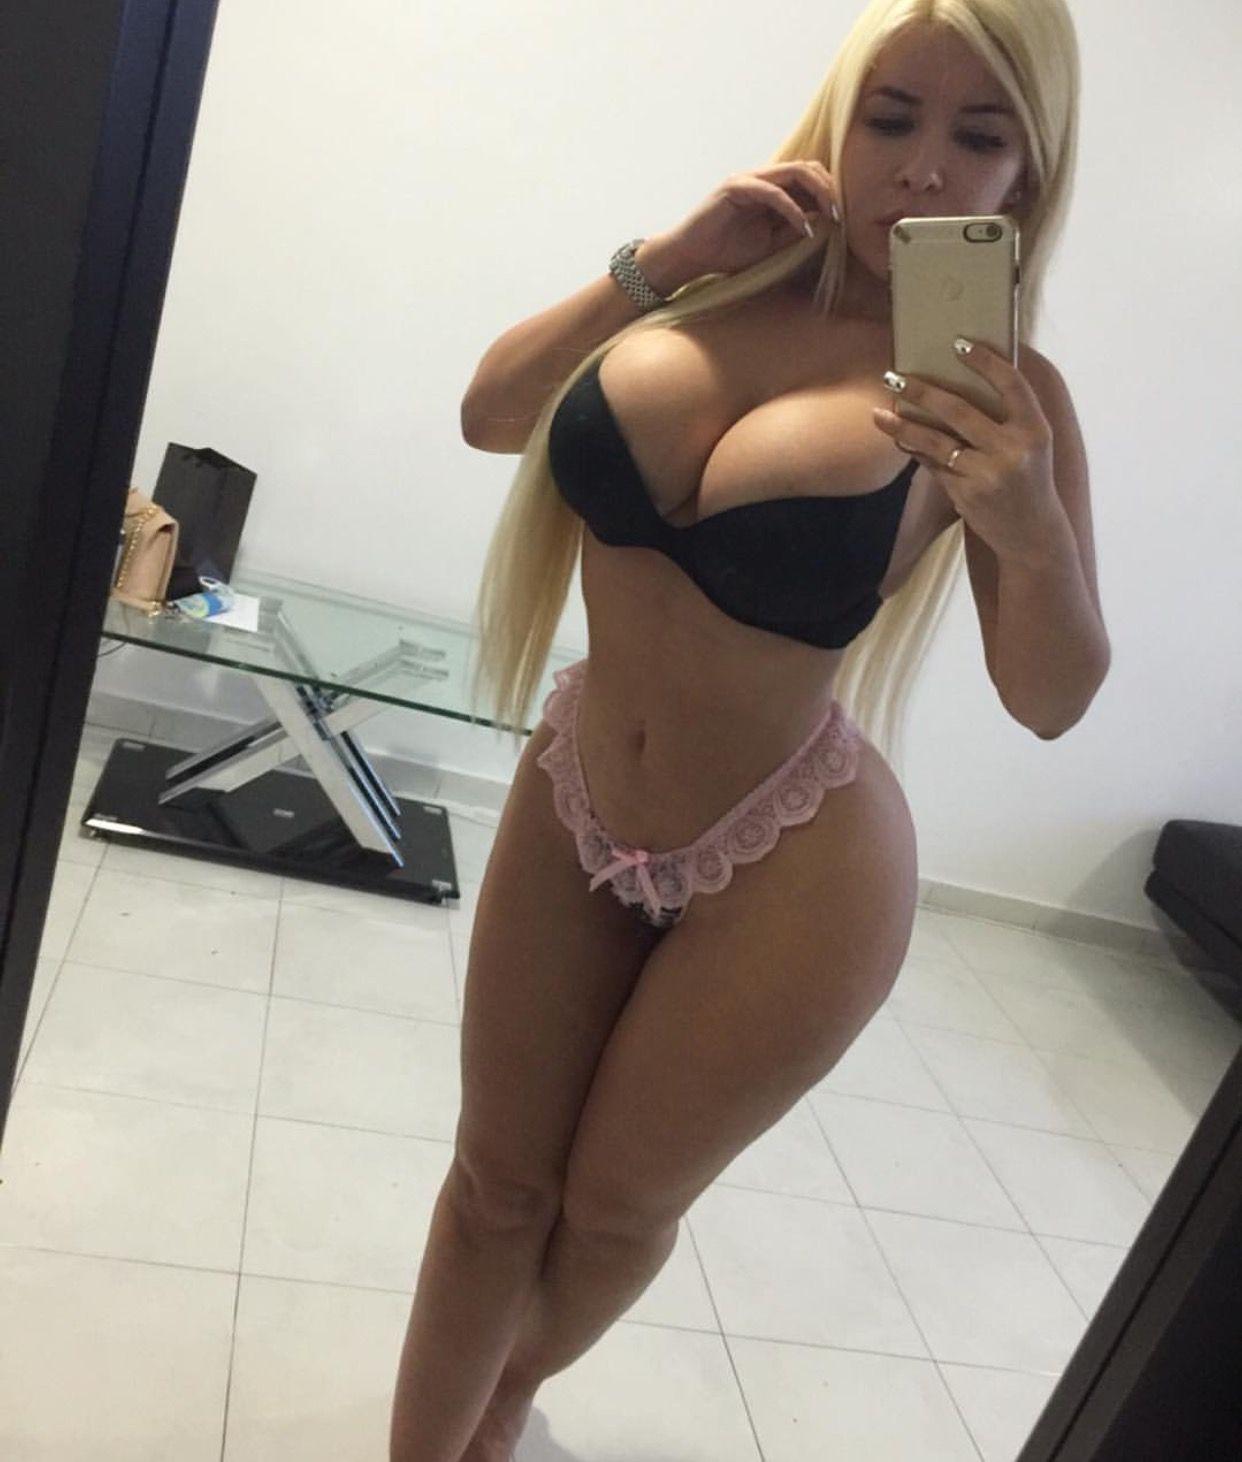 Mika Tan Suck Dick